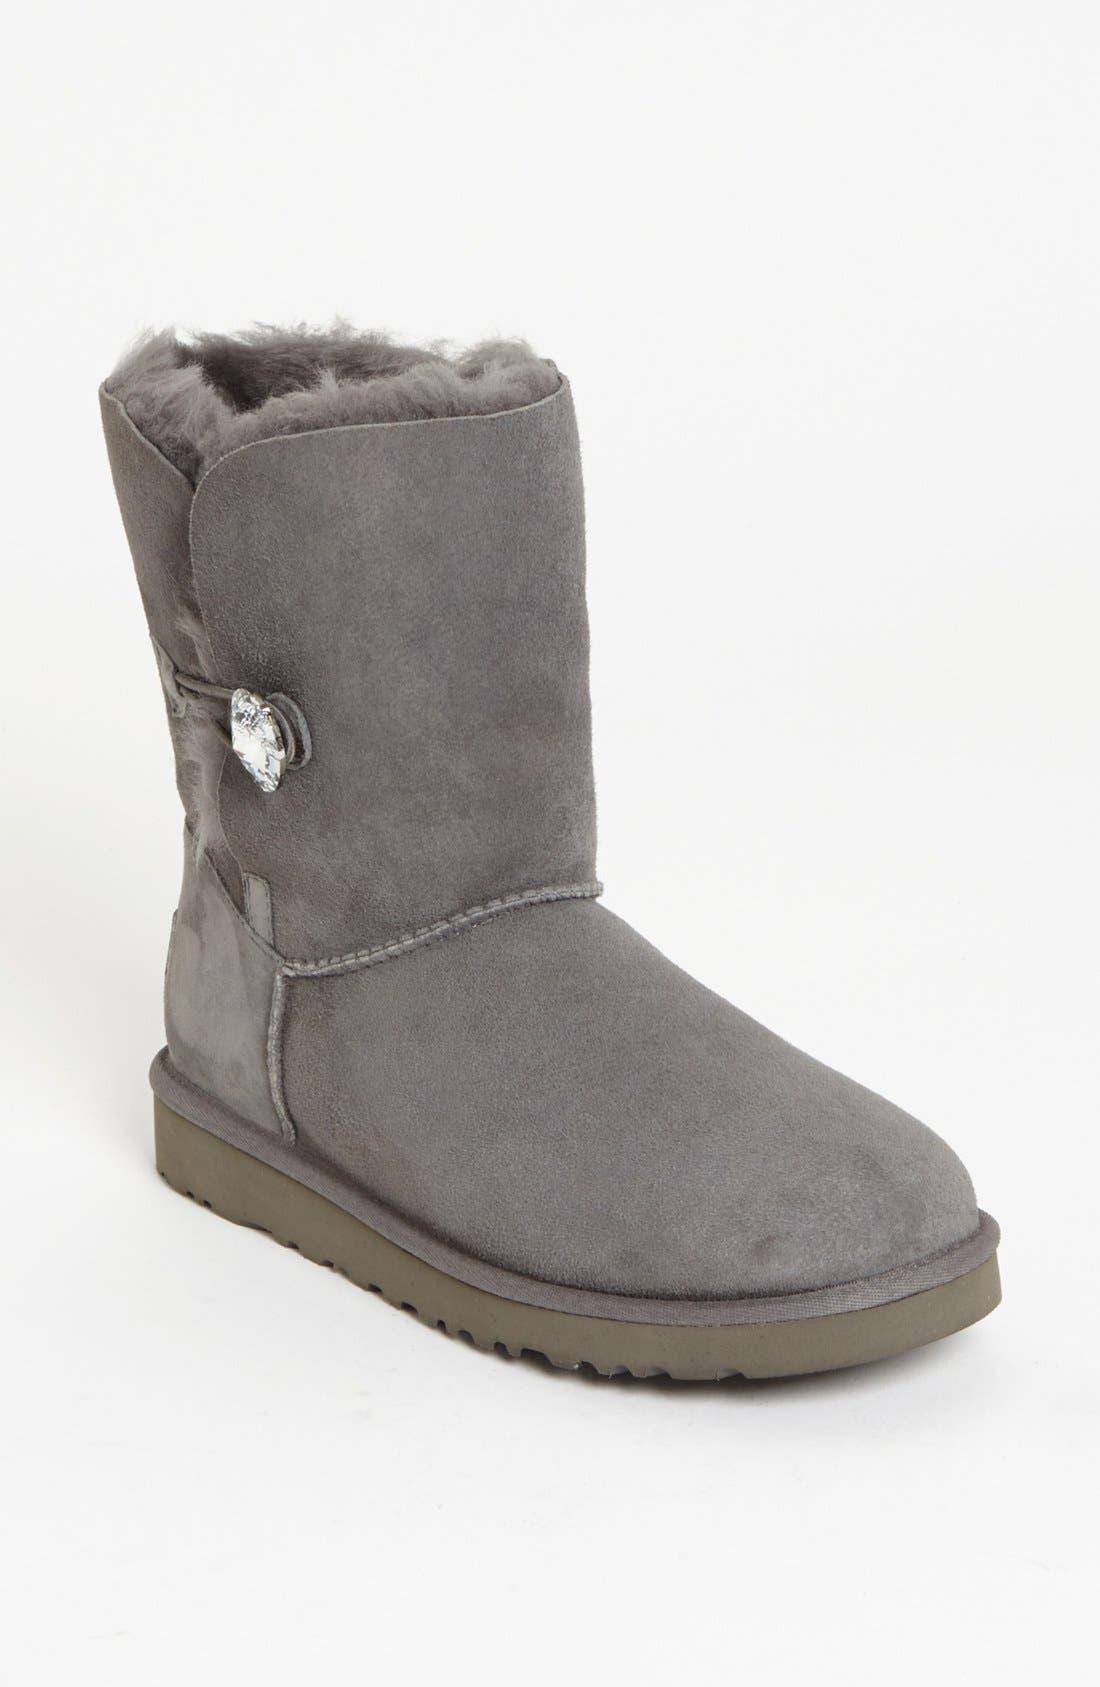 Main Image - UGG® Australia 'Bailey Button Bling' Boot (Women)